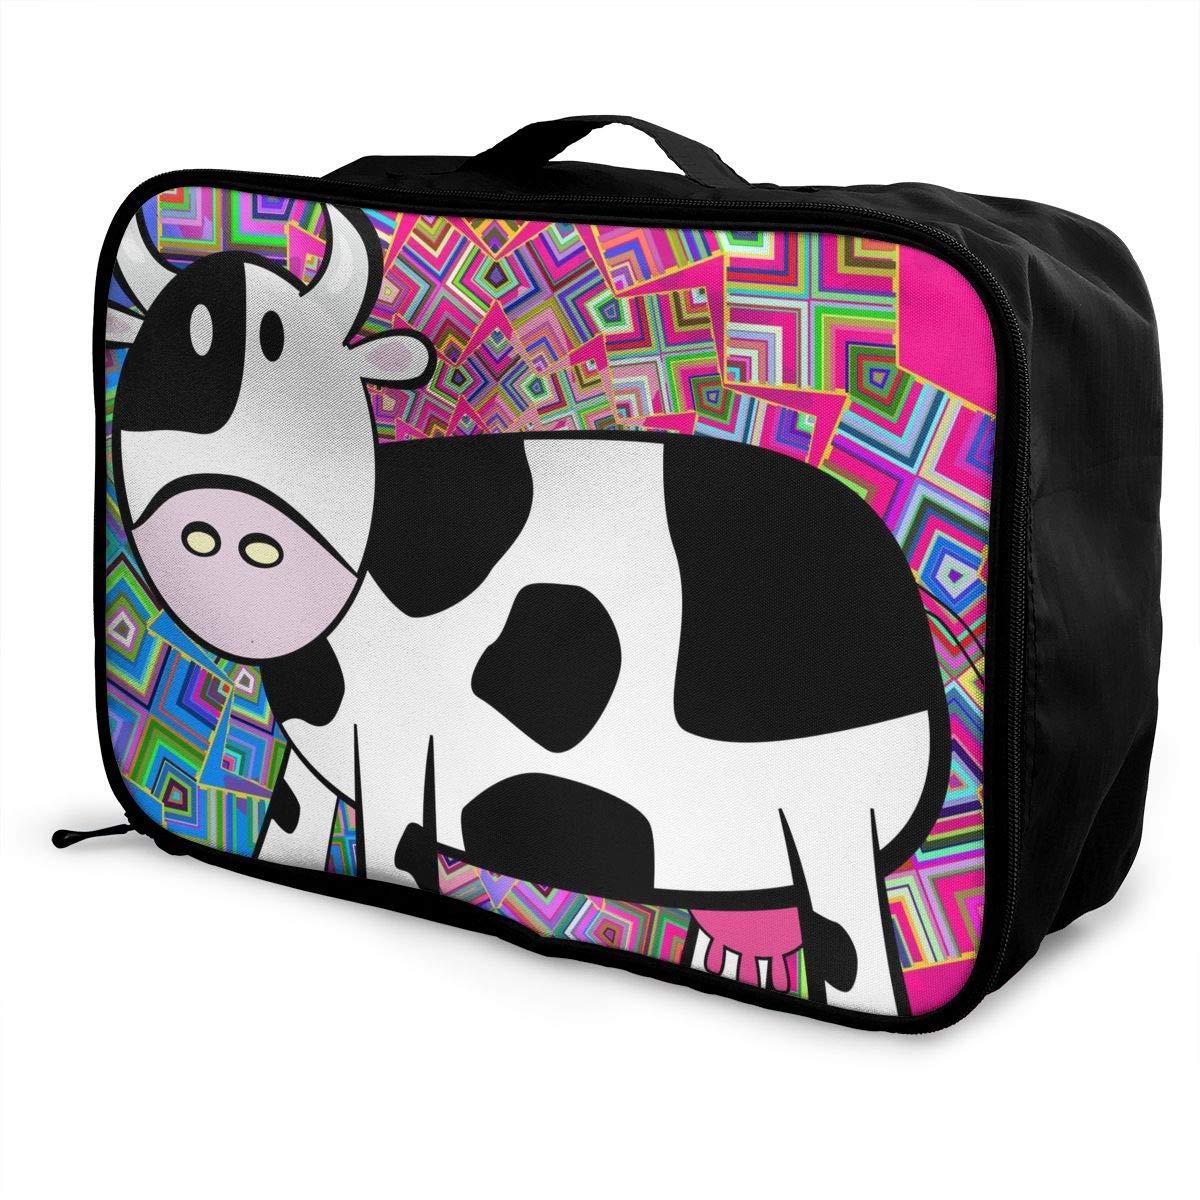 Lightweight Large Capacity Portable Duffel Bag for Men /& Women Cartoon Milk Cow Travel Duffel Bag Backpack JTRVW Luggage Bags for Travel